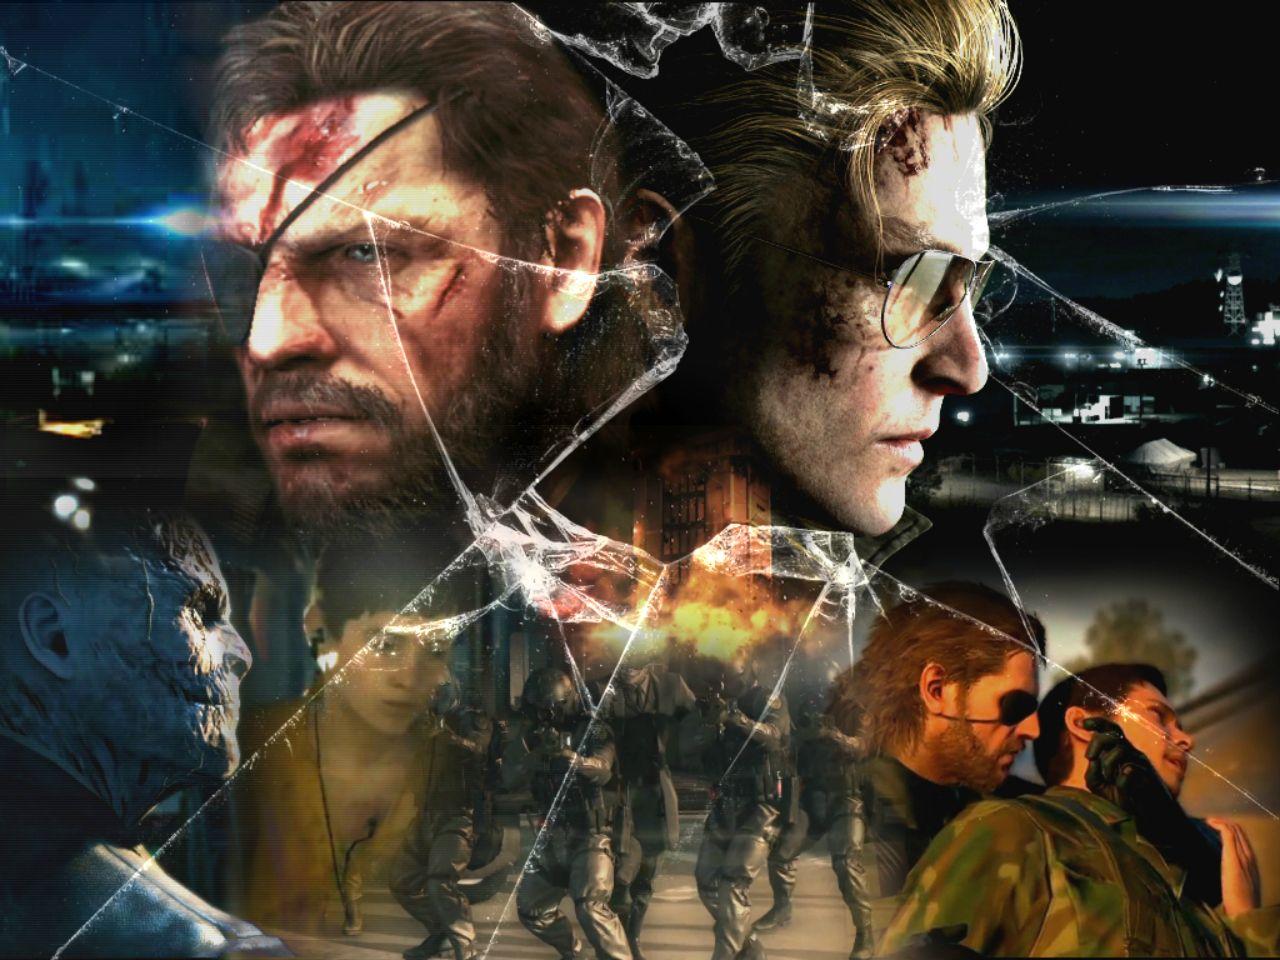 Video Game - Metal Gear Solid V: The Phantom Pain Metal Gear Solid Big Boss (MGS) Fire Solid Snake Kaz Explosion Chico Broken Glass Wallpaper